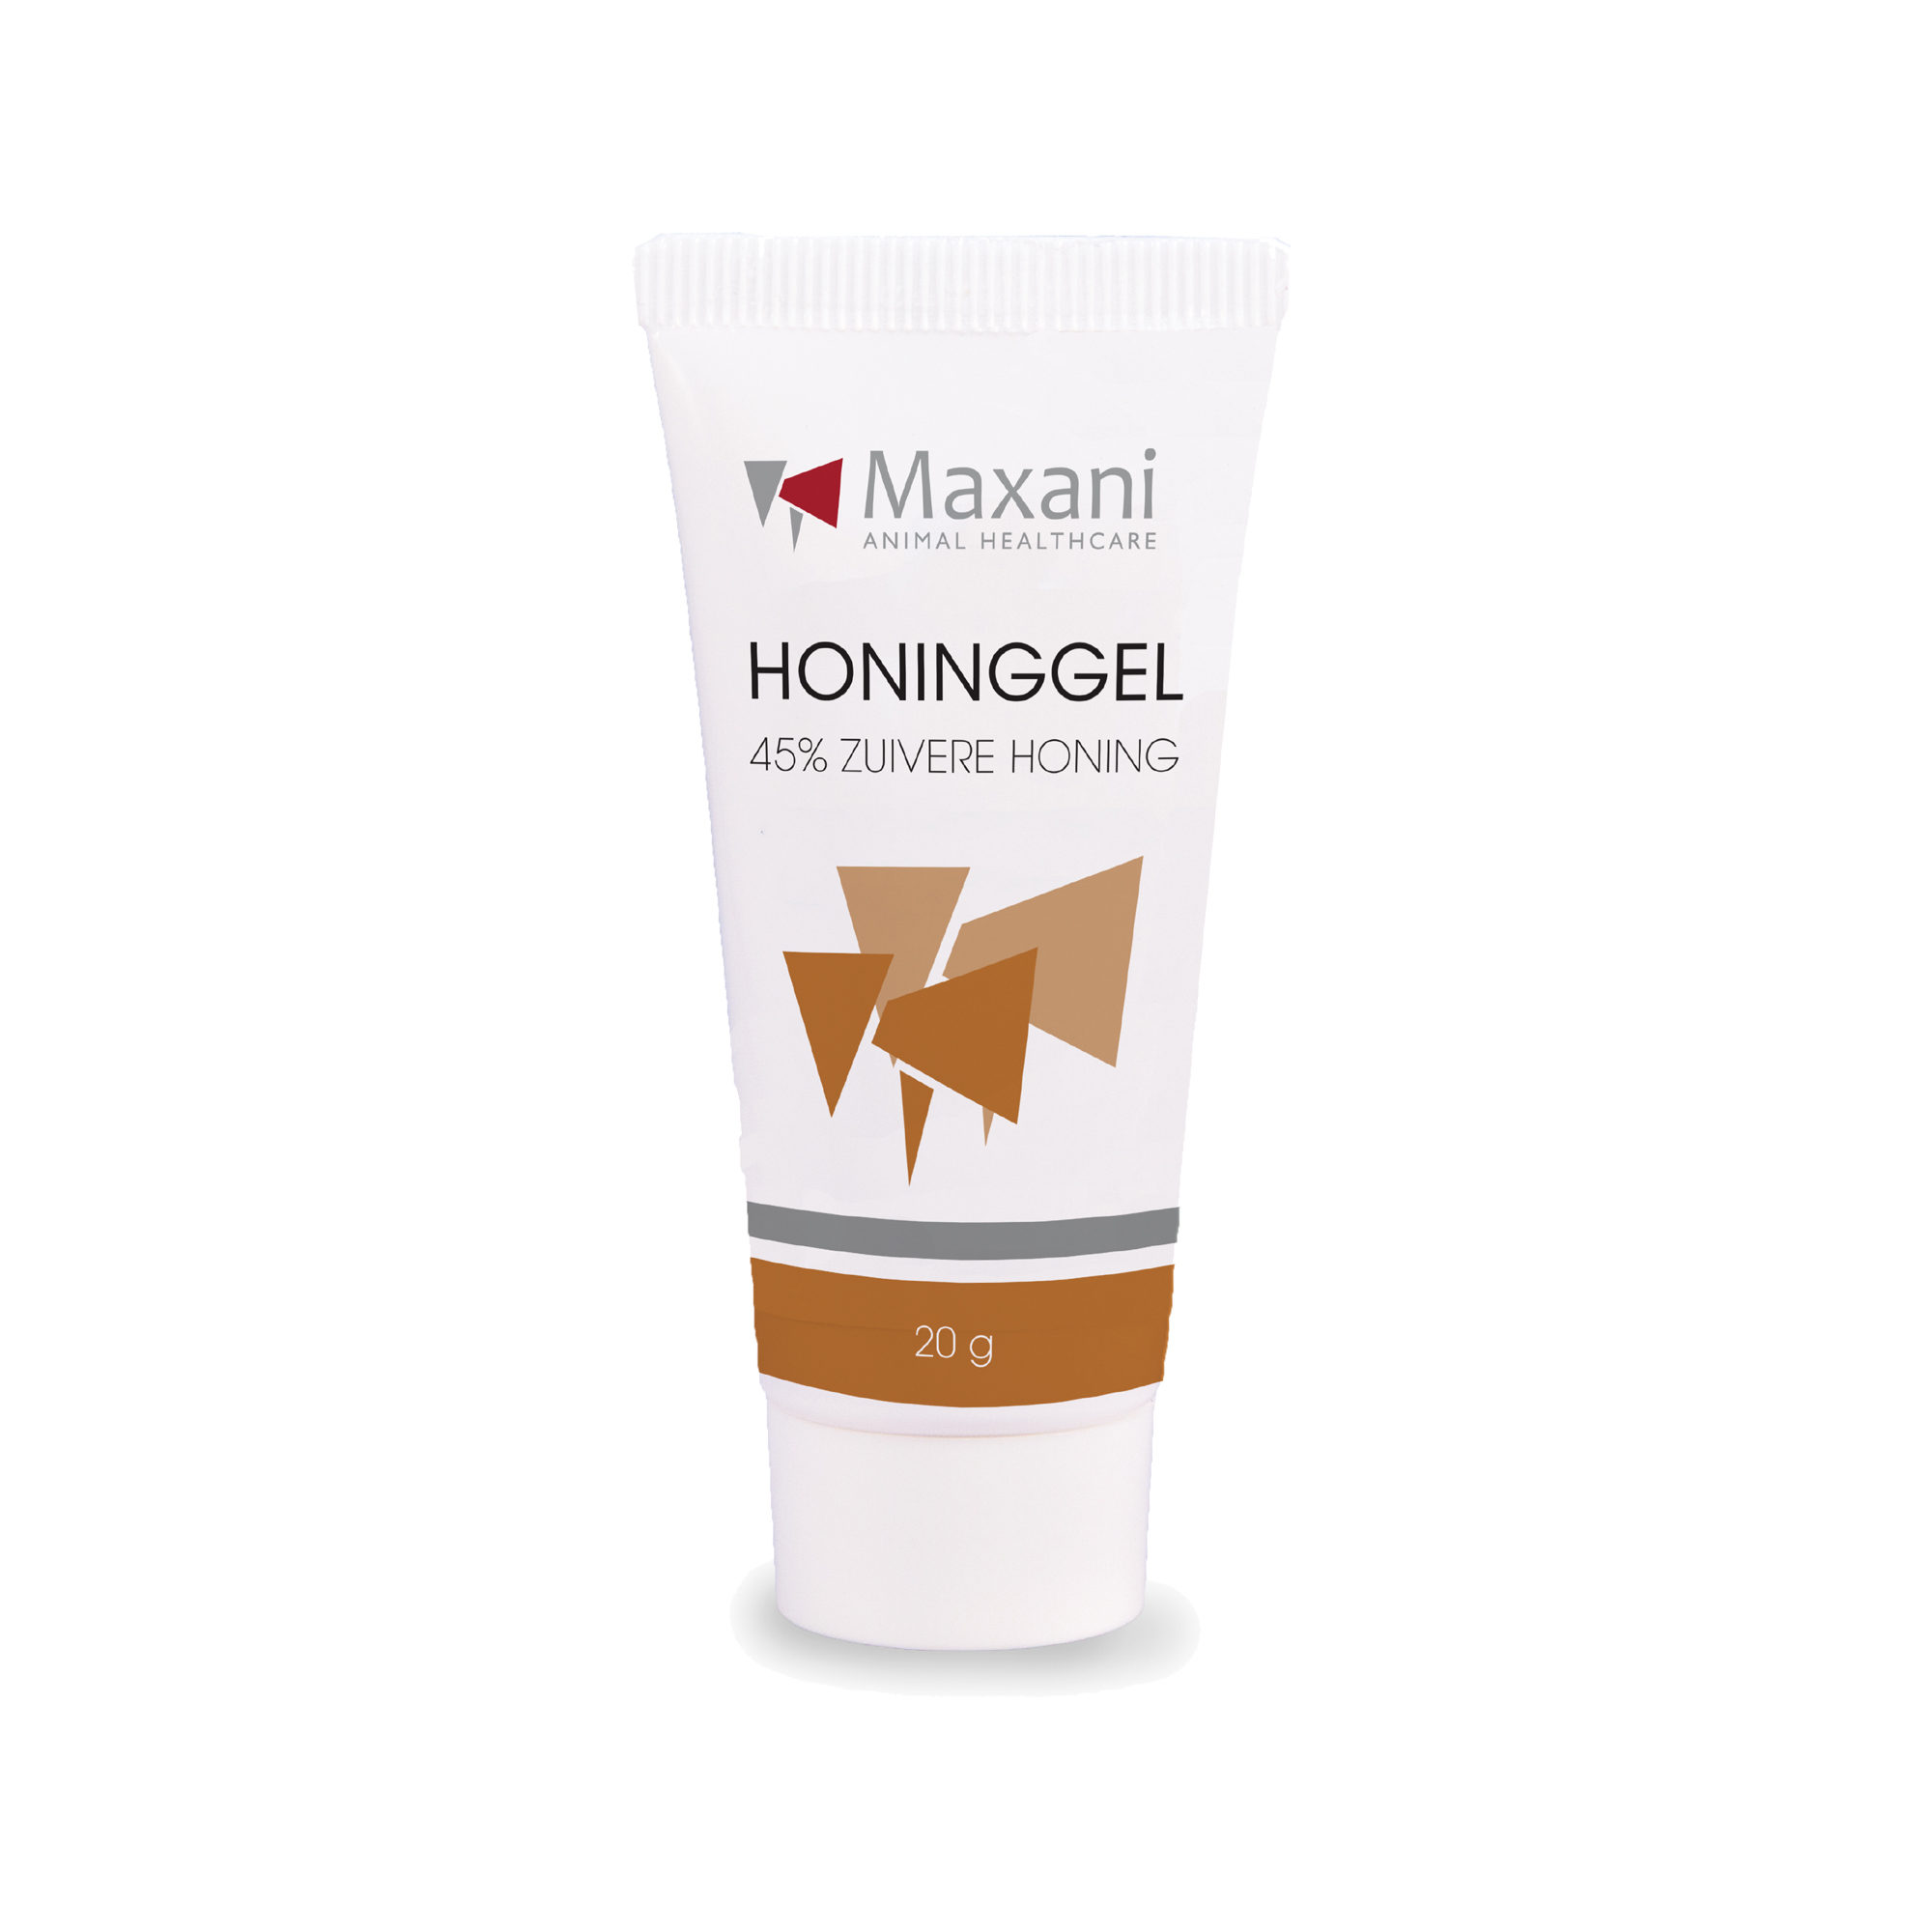 Maxani Honiggel